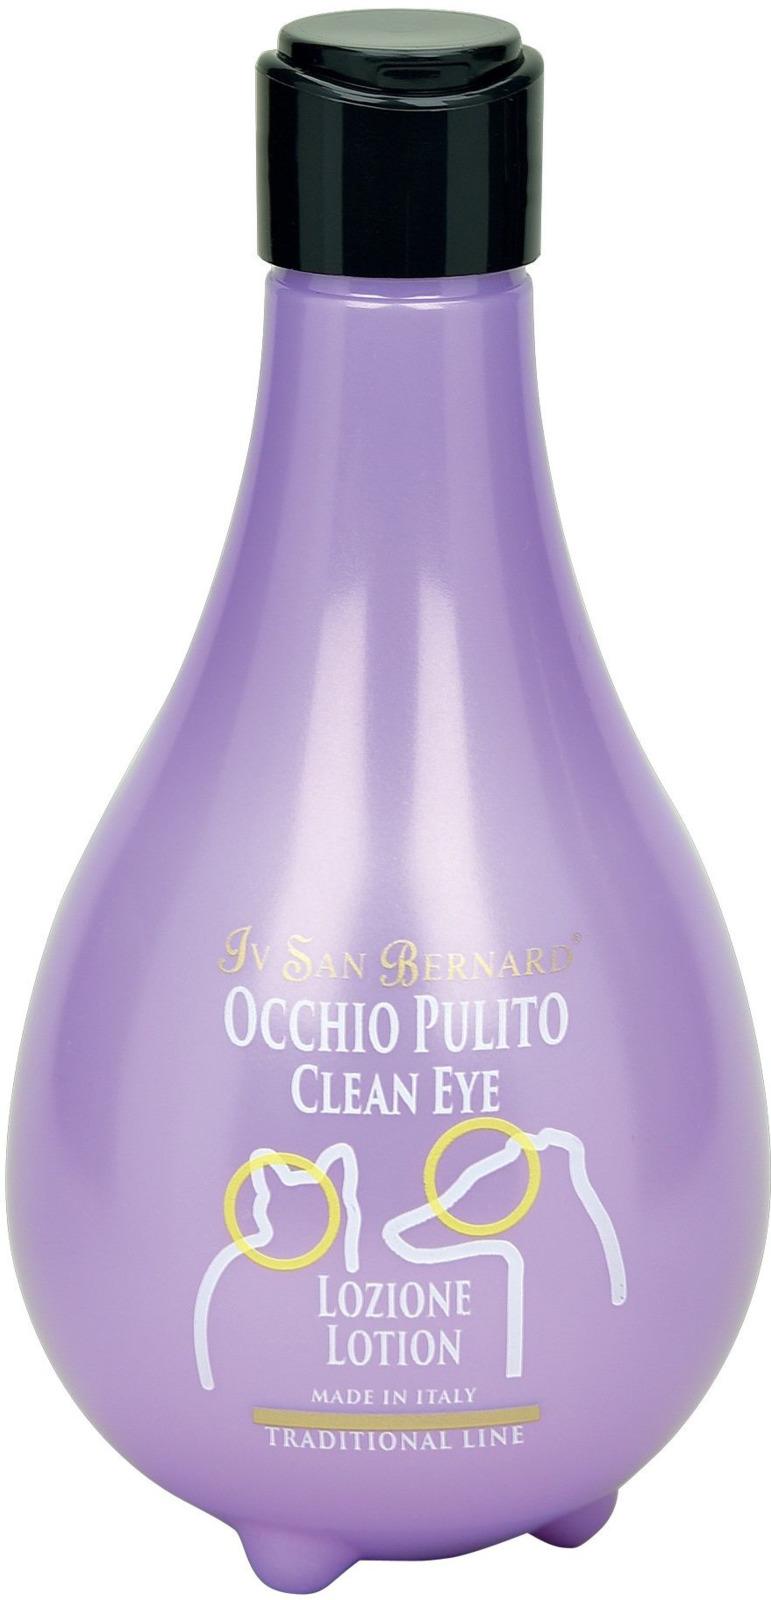 Лосьон для животных Iv San Bernard ISB Traditional Line Clean Eye, для очистки глаз, 250 мл лосьон для глаз veda ромашка 3штх10мл